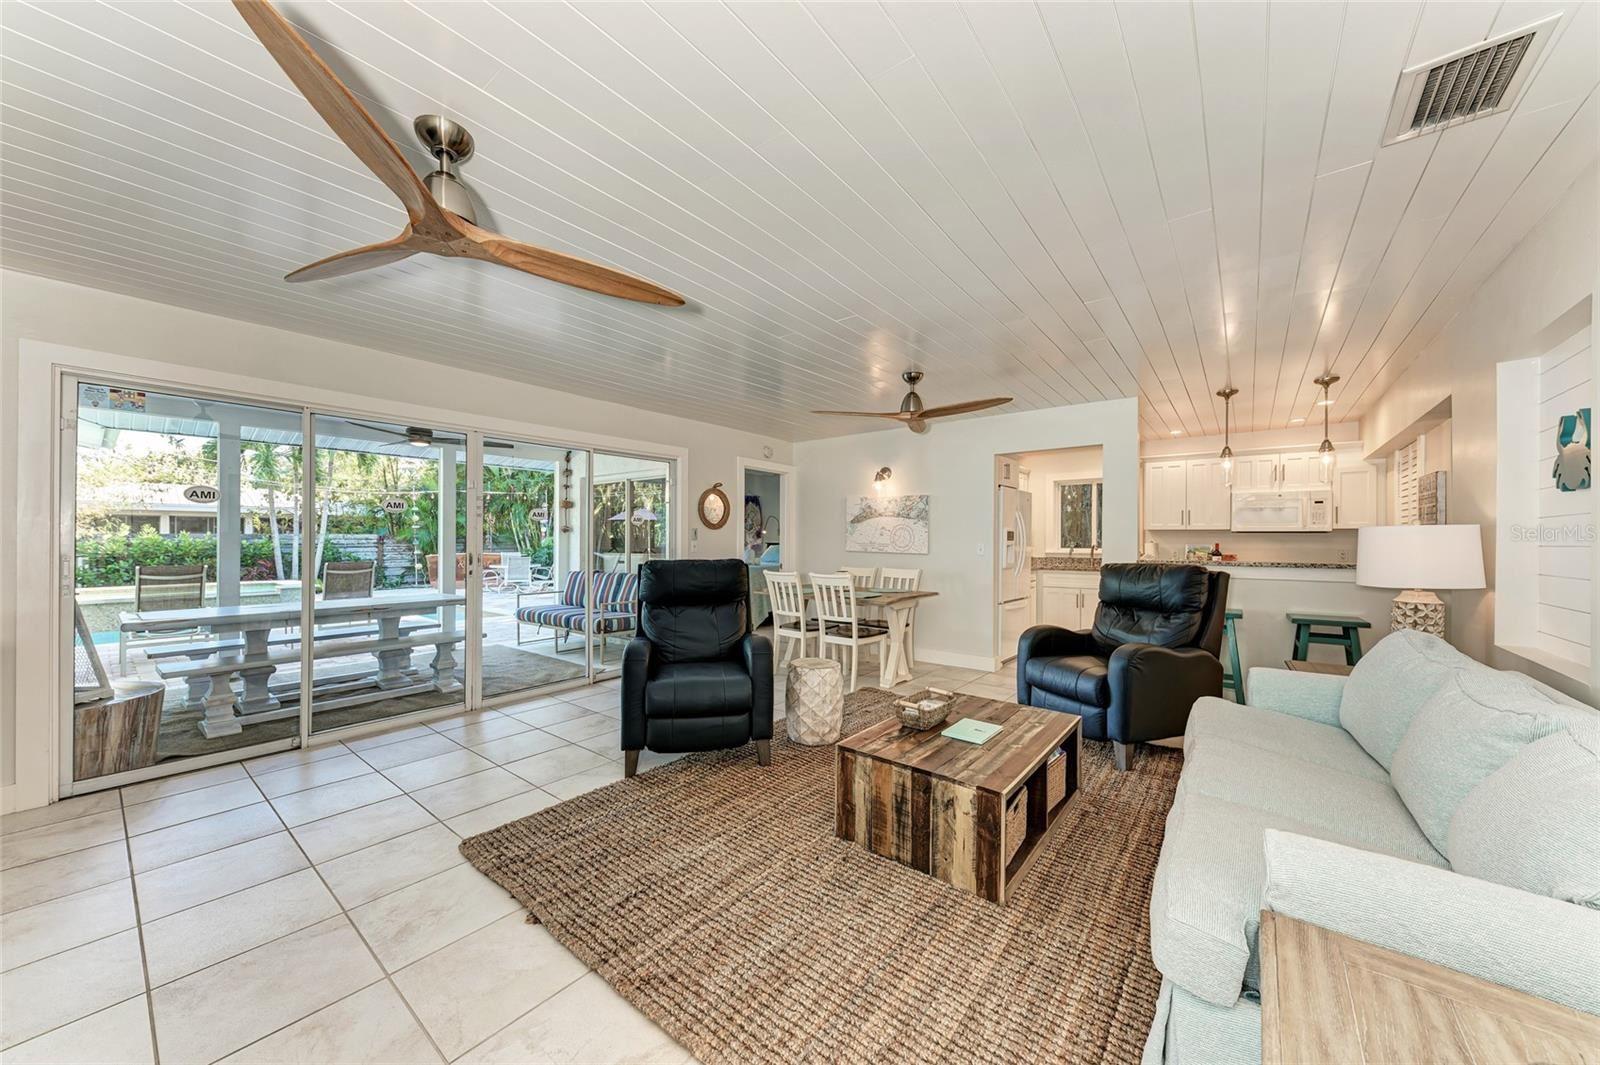 Photo of 205 72ND STREET, HOLMES BEACH, FL 34217 (MLS # A4504521)